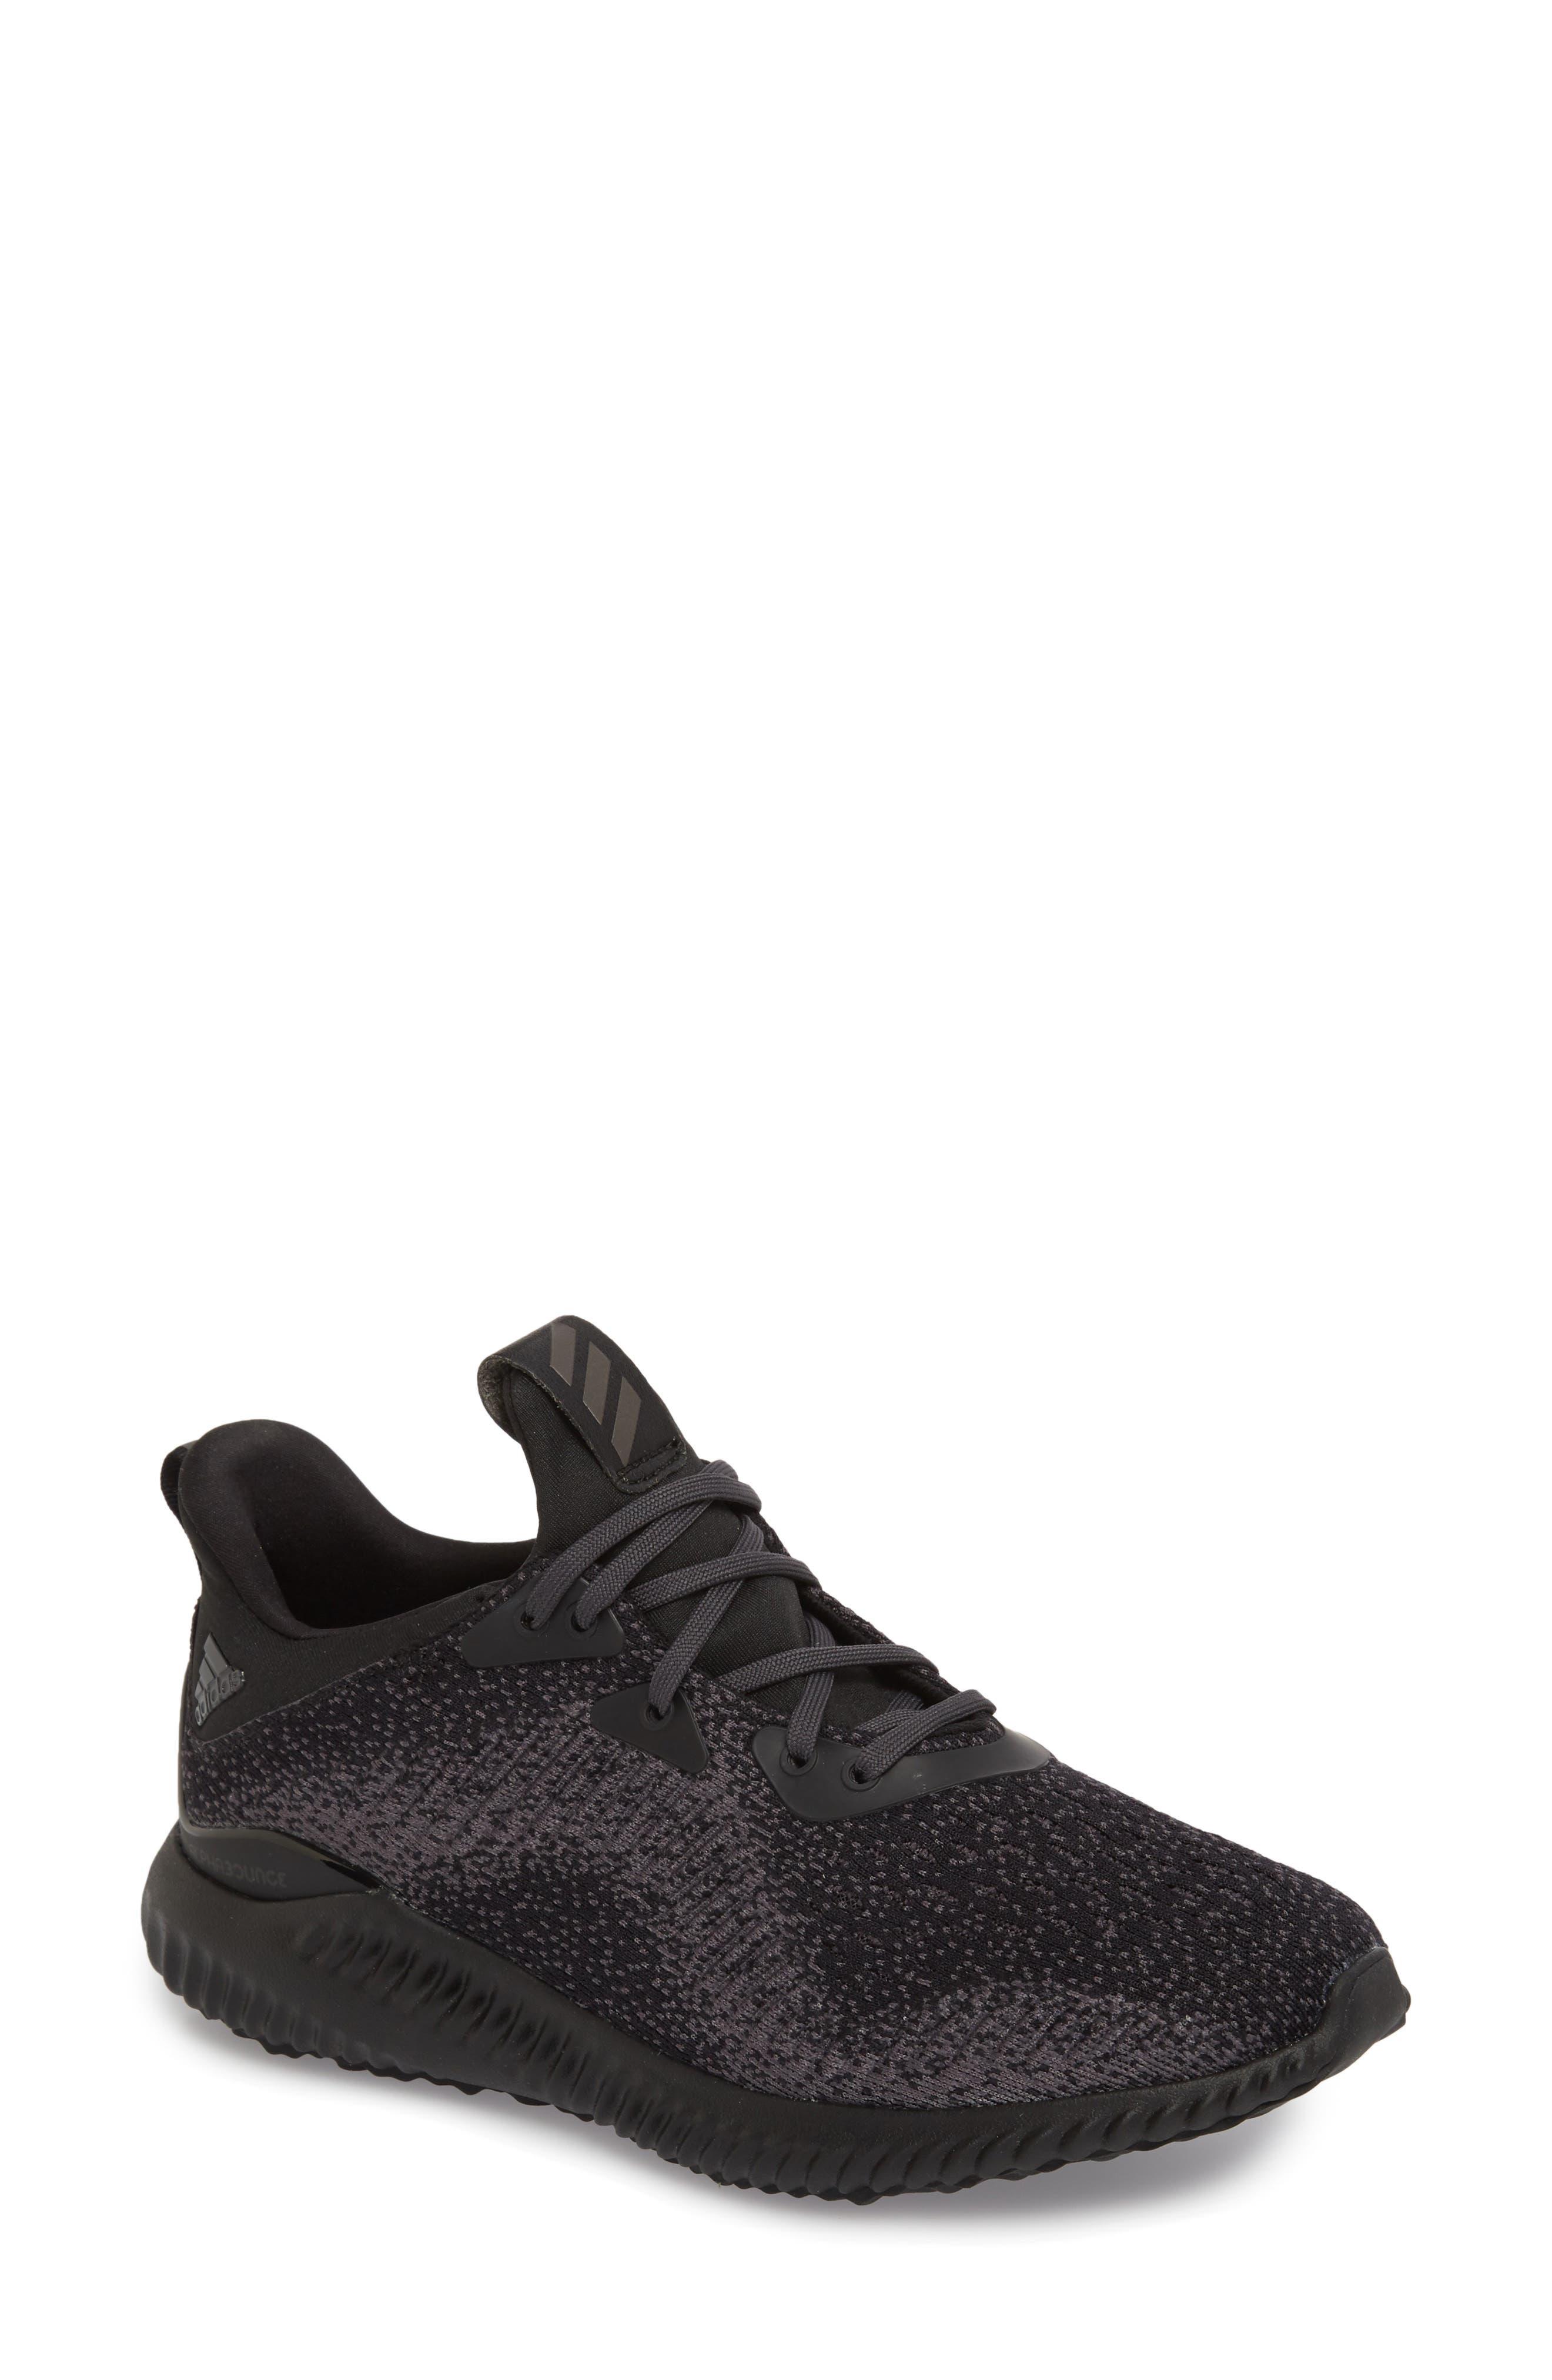 AlphaBounce EM Running Shoe,                             Main thumbnail 1, color,                             Core Black/ Trace Grey/ Carbon